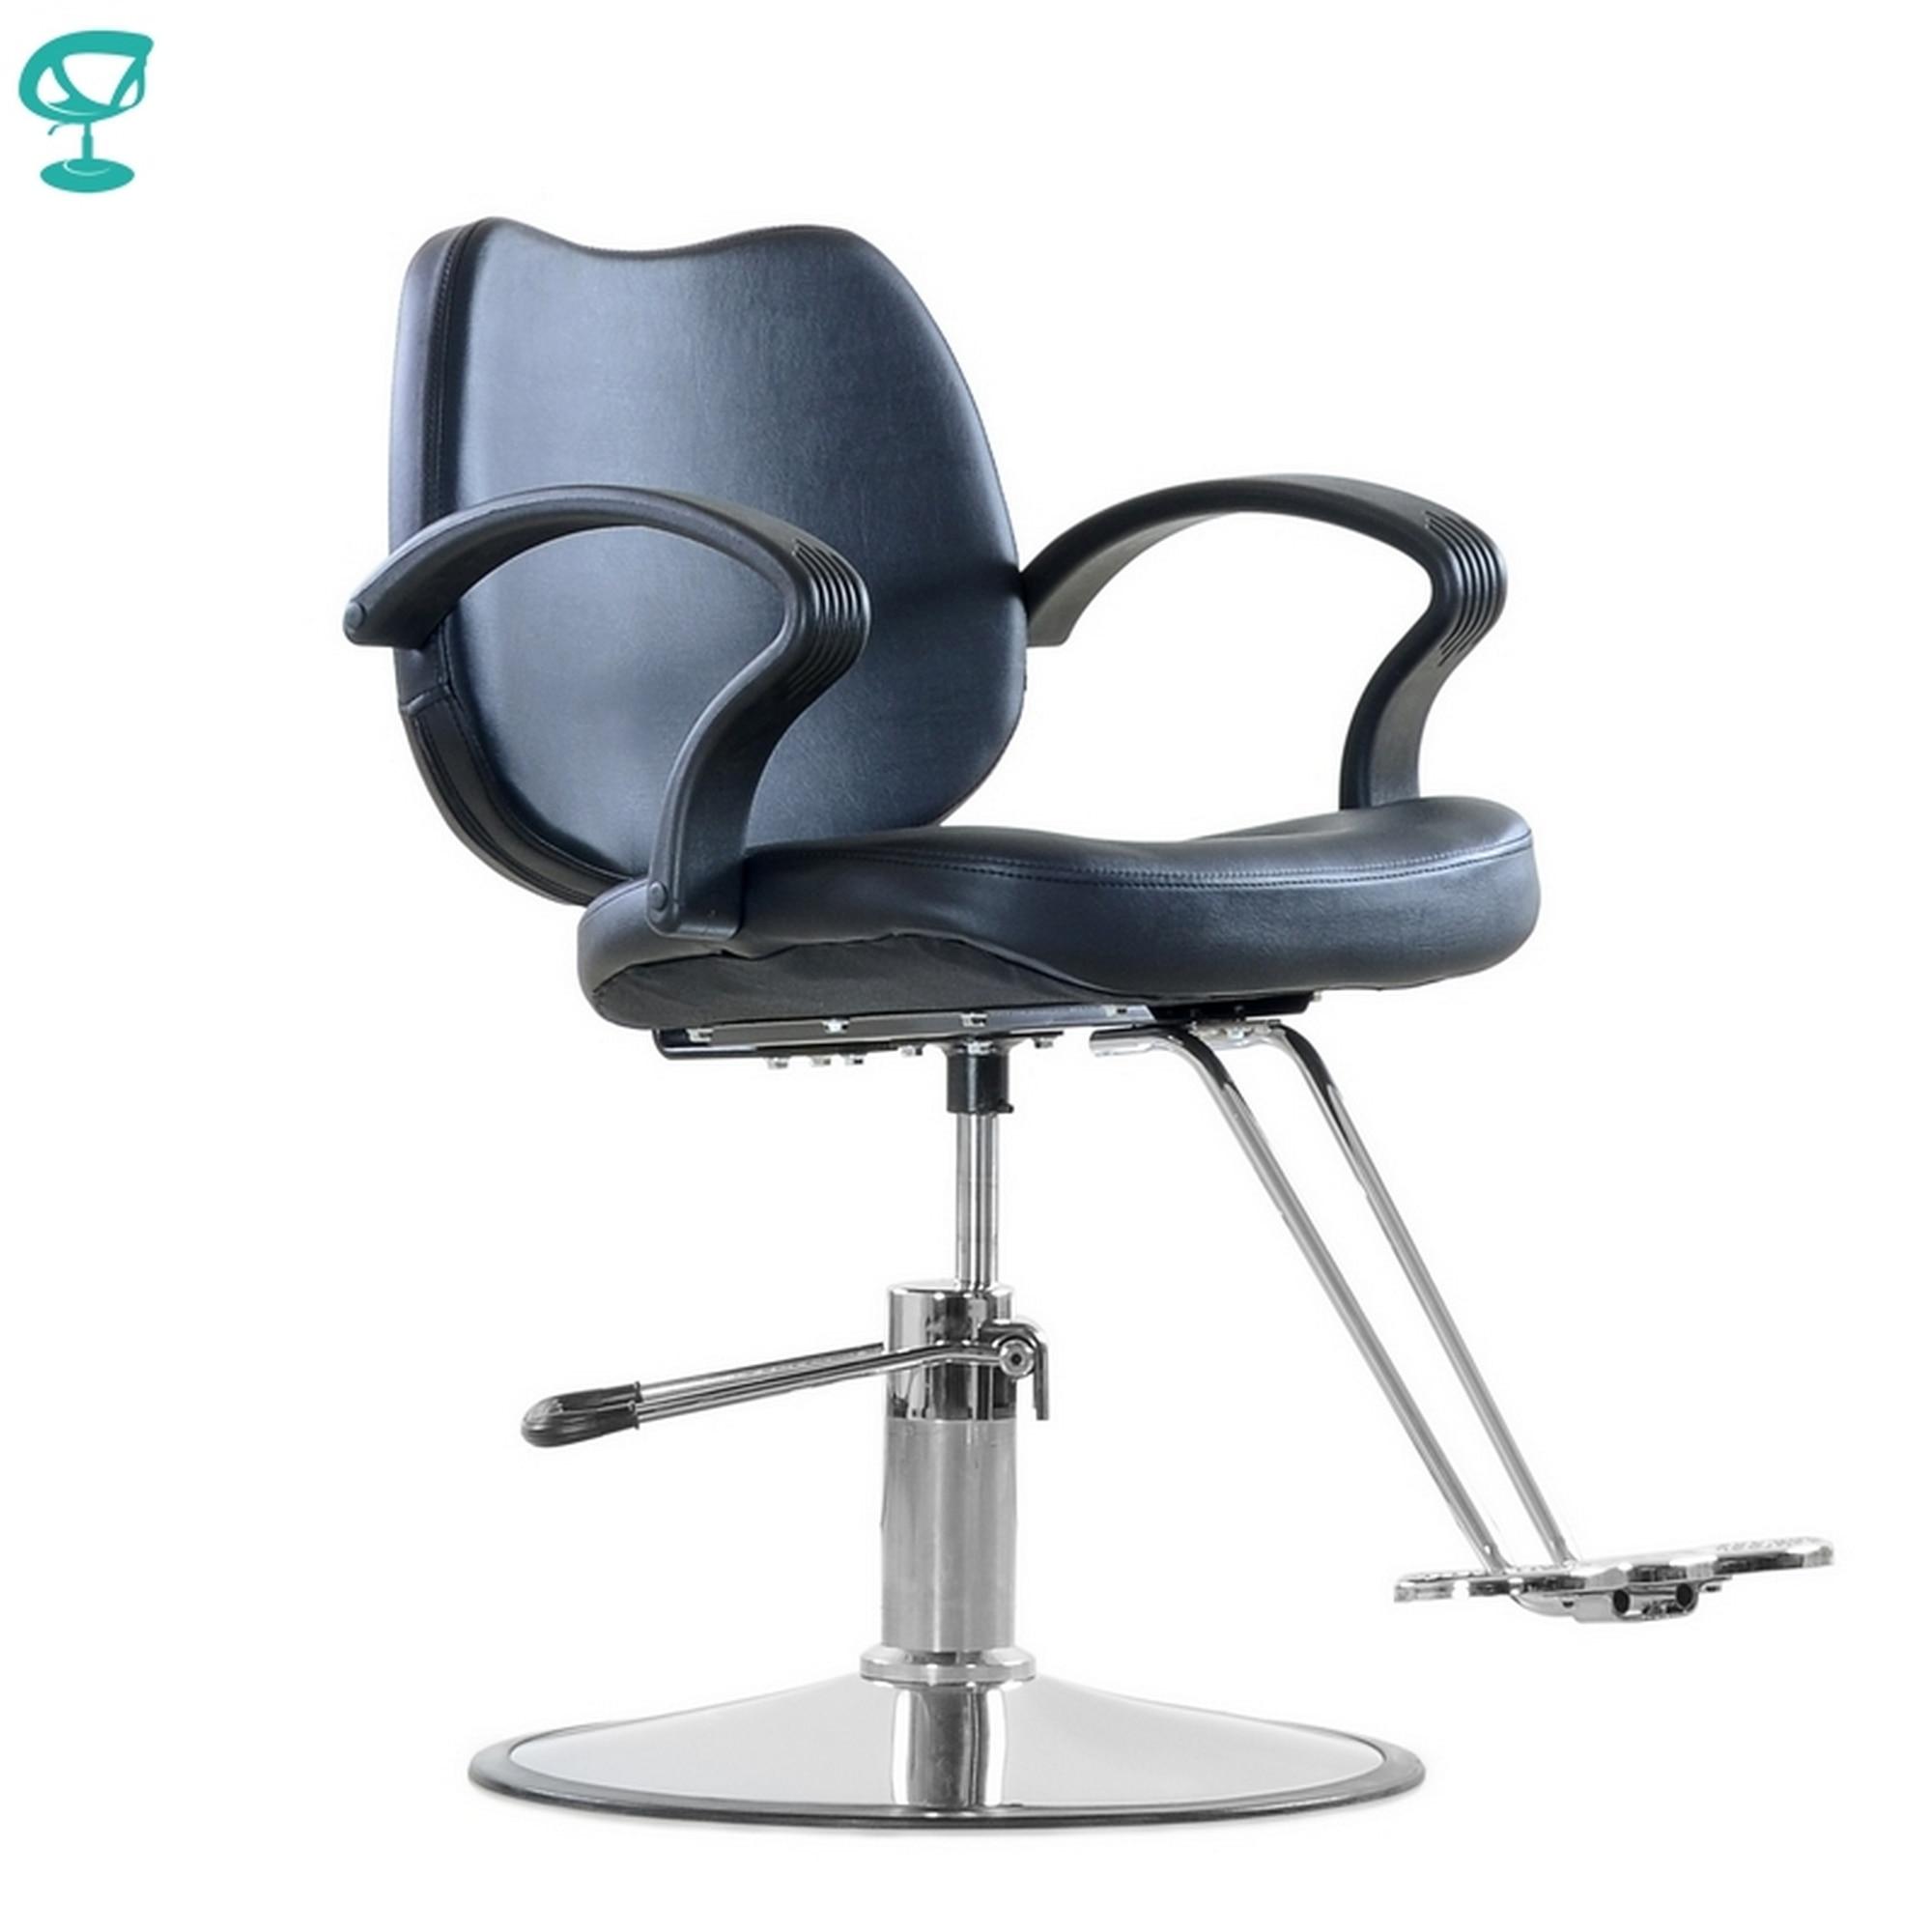 95708 Barneo 6219D Chair Salon Chair Black Chair барбершопа Chair Free Shipping To Russia